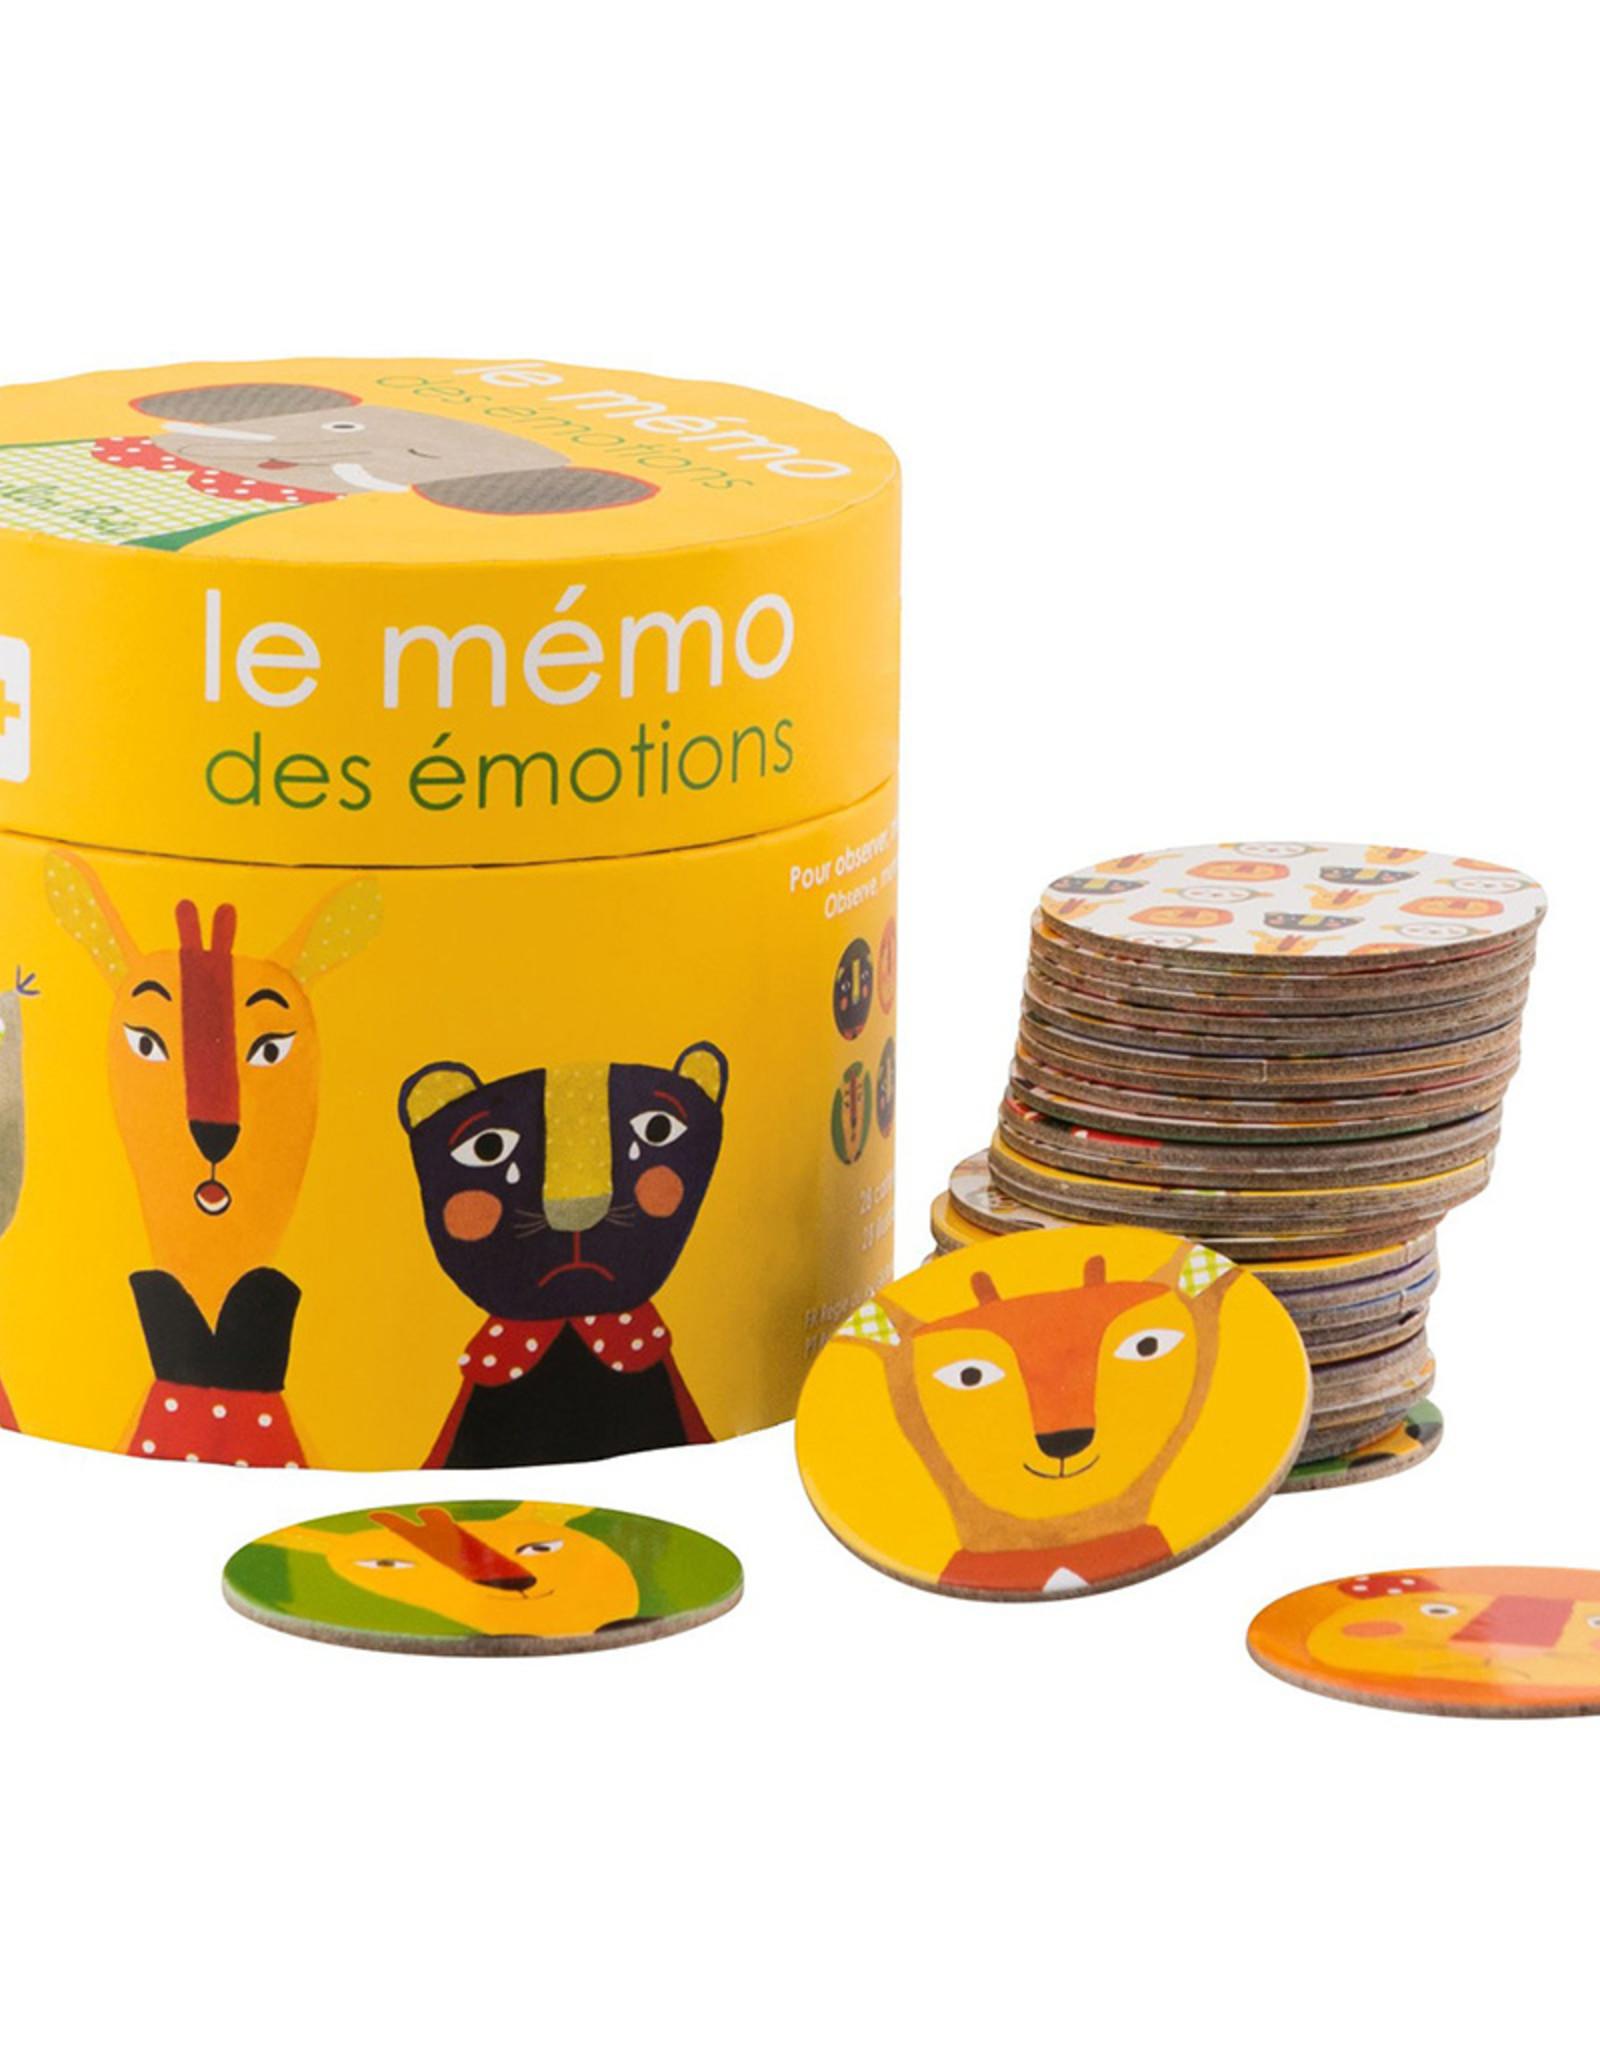 Moulin Roty Mémo des émotions